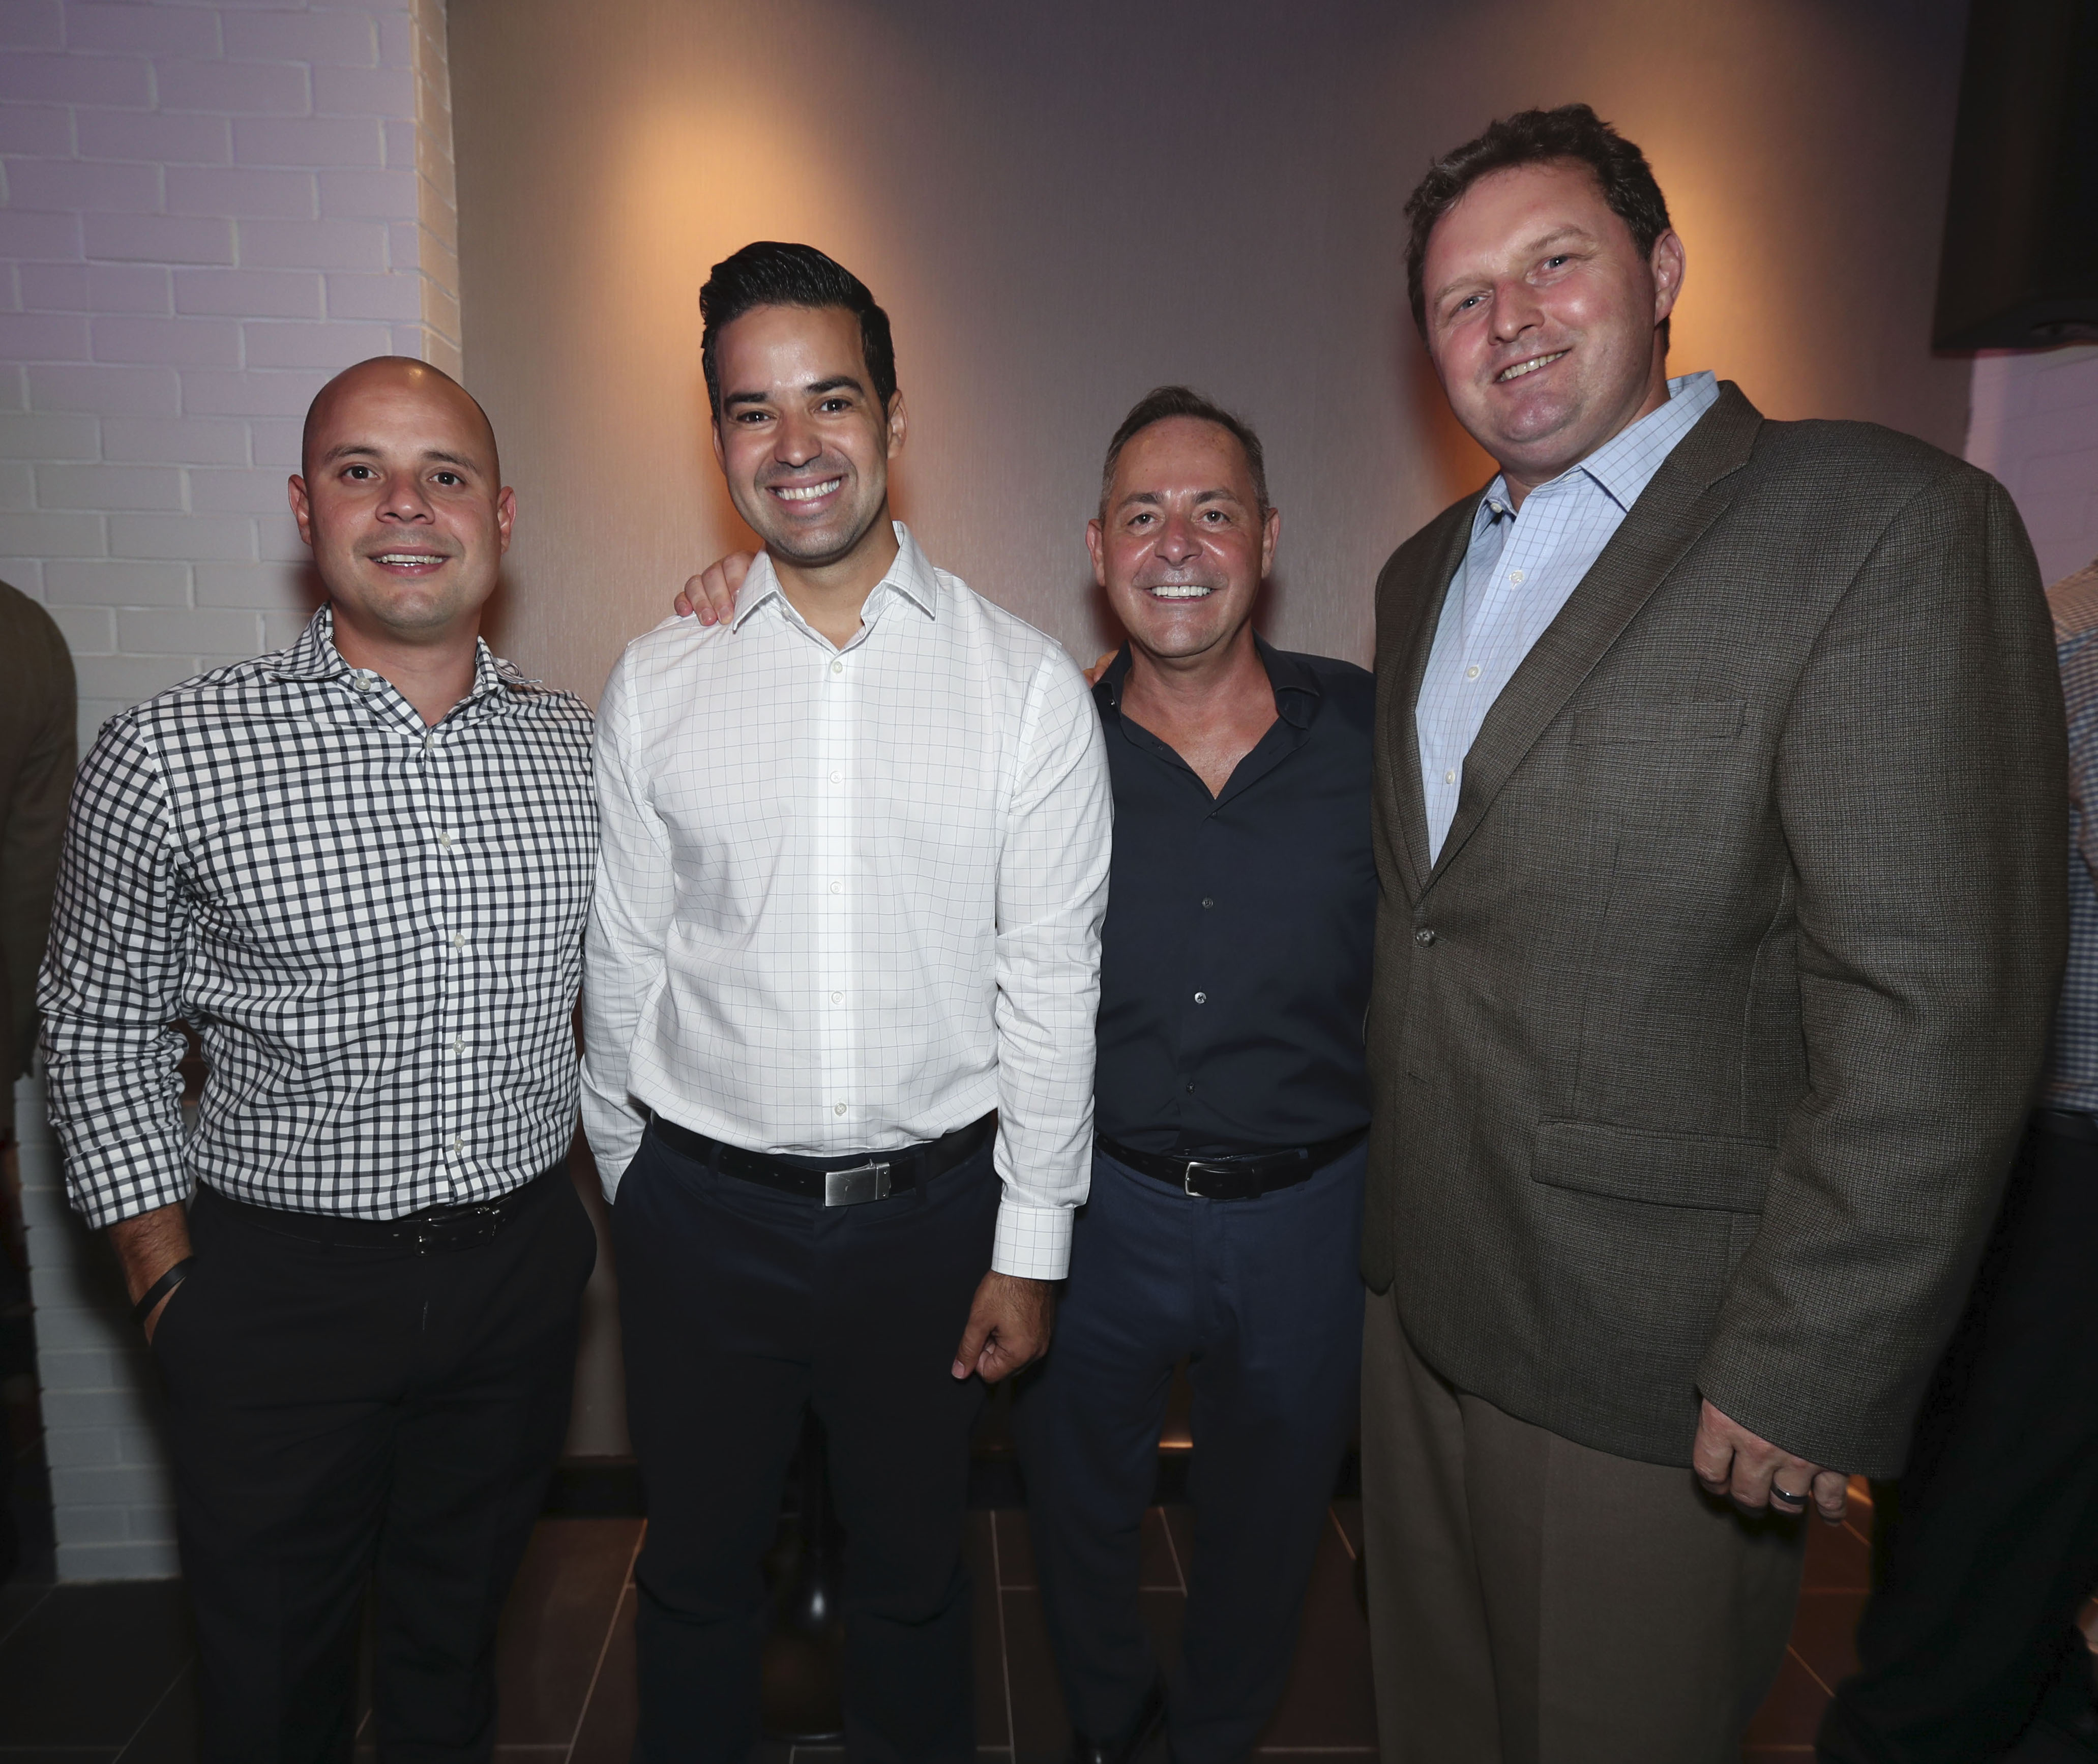 Jay Ortiz, Raúl García, Albert Charbonneau y Ben Tutt. (Suministrada)